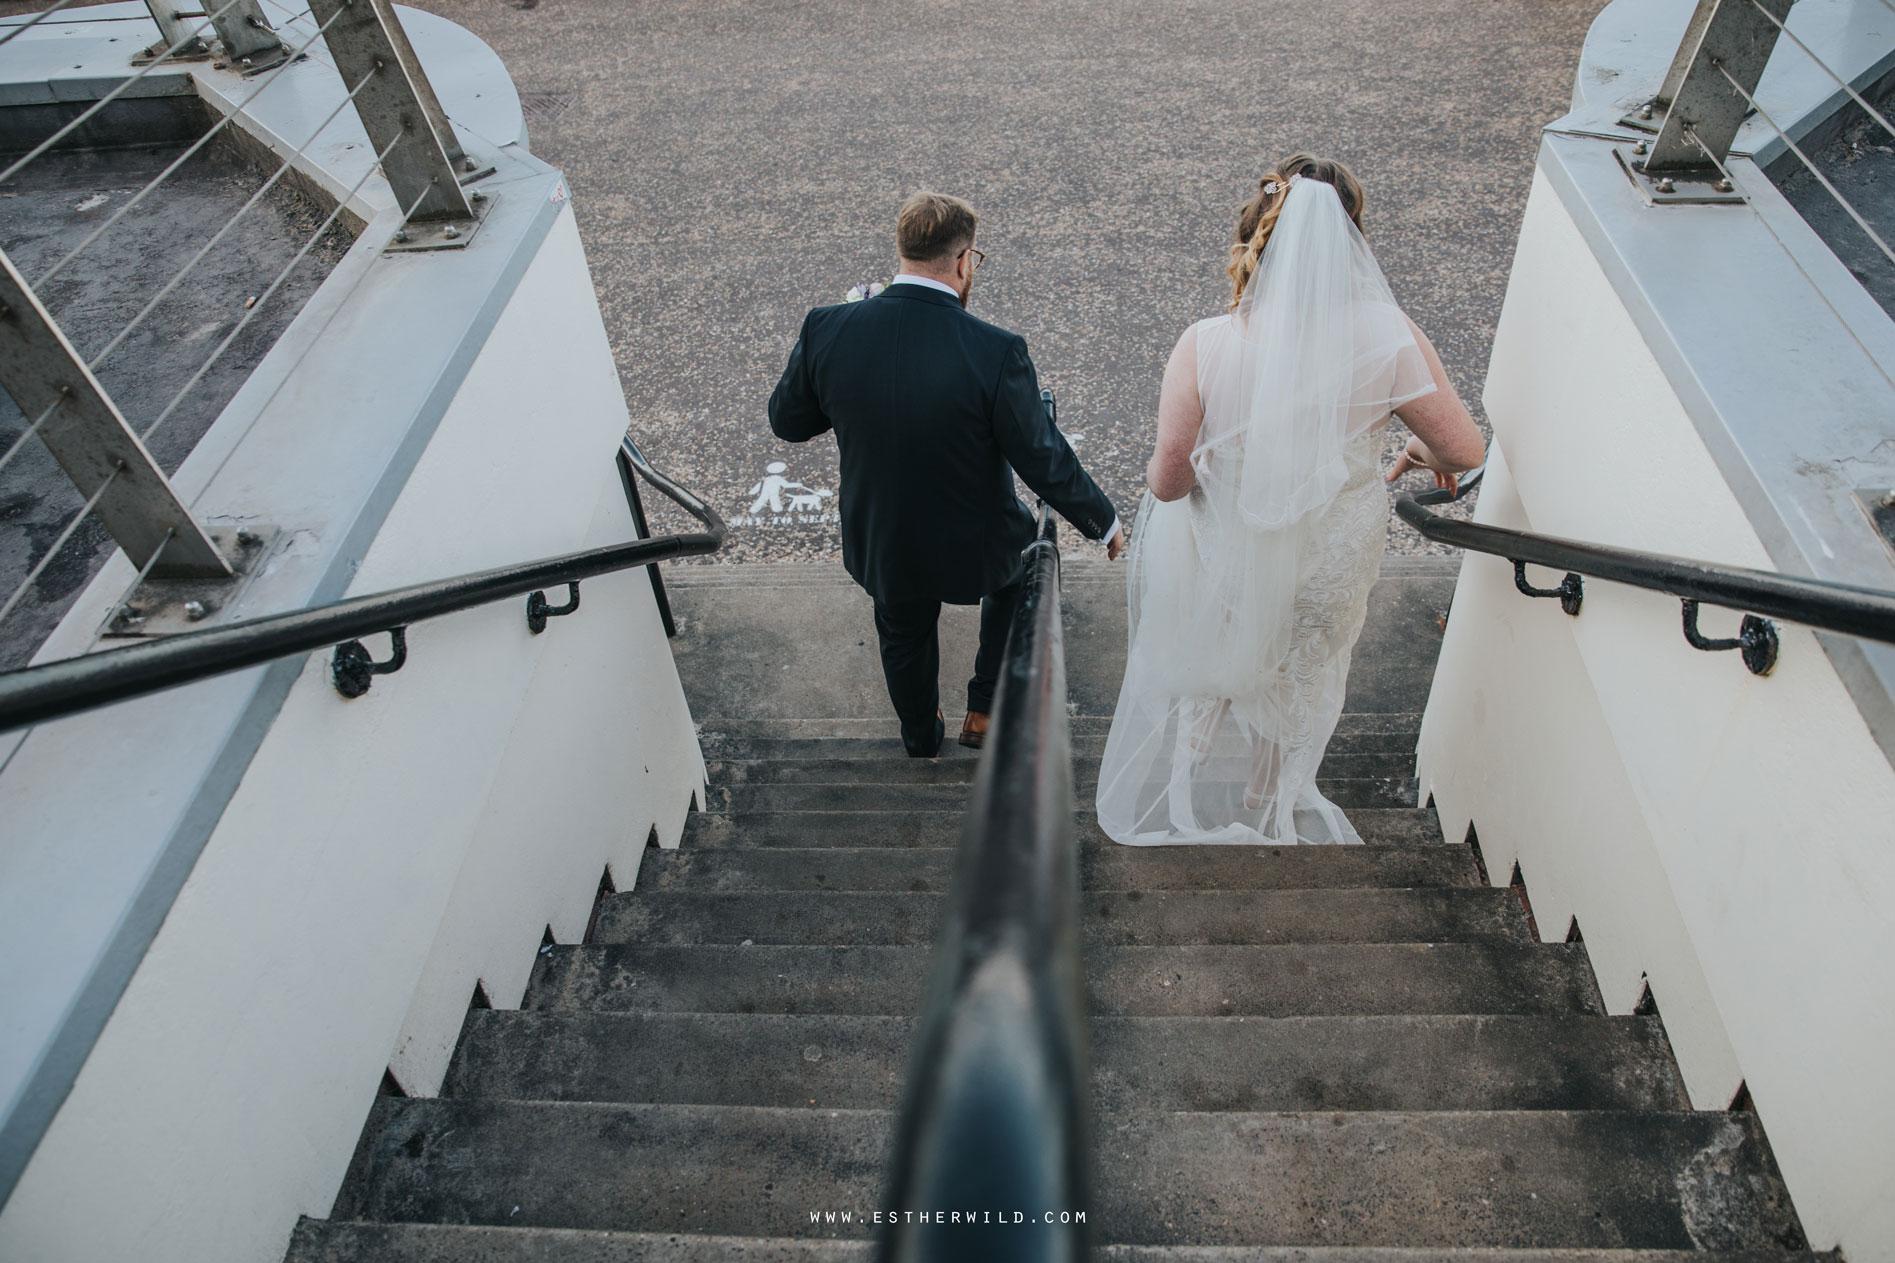 Cromer_Wedding_Beach_Outdoor_Ceremony_Norfolk_North_Lodge_Registry_Office_Rocket_House_Cafe_Cromer_Pier_IMG_4554.jpg